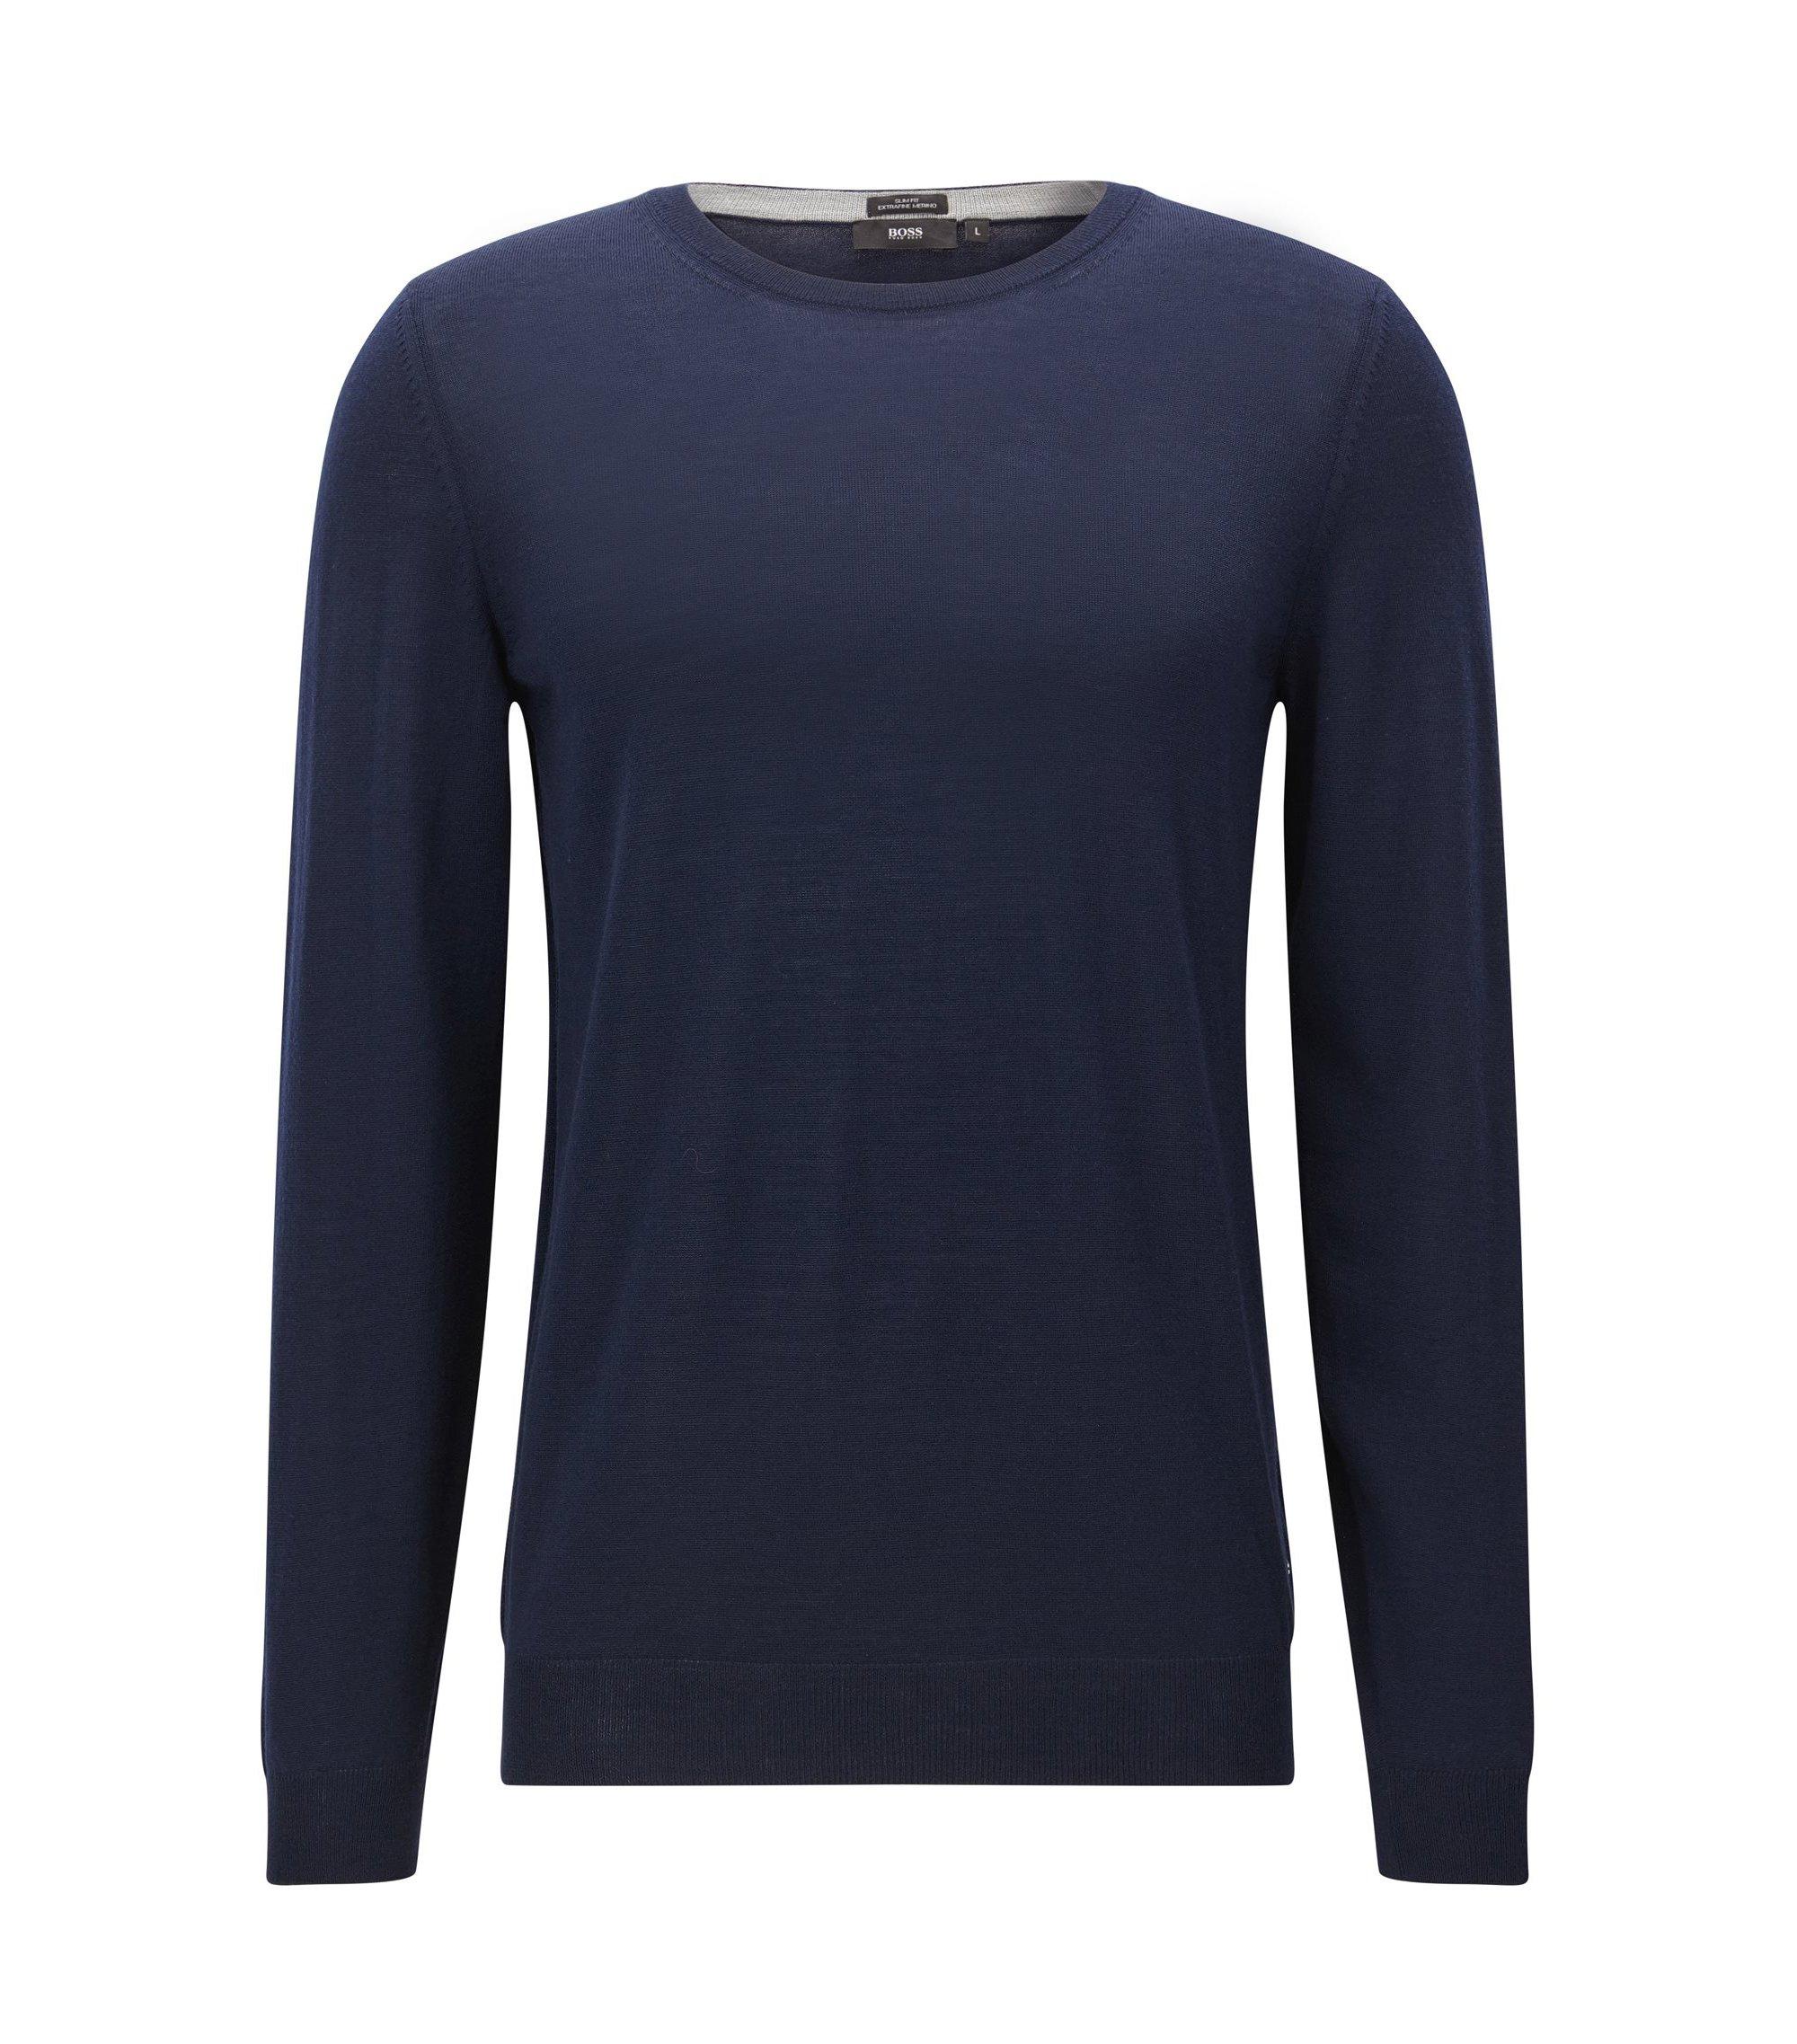 Maglione slim fit in lana vergine extra sottile, Blu scuro